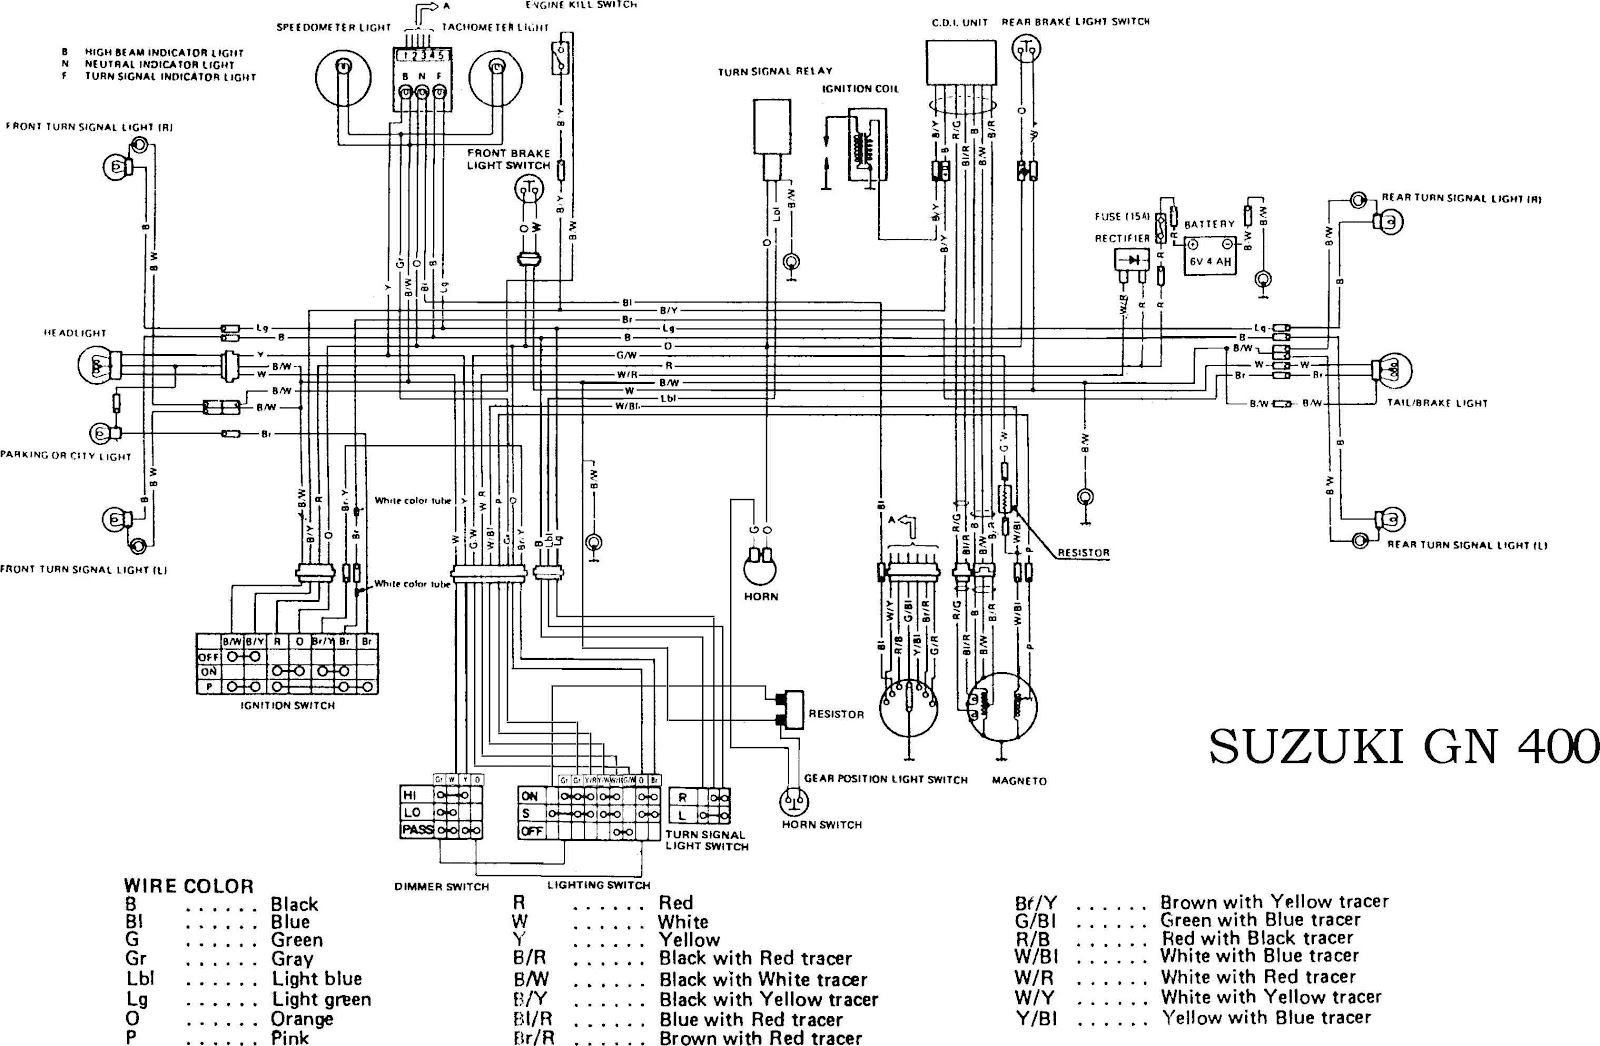 1998 honda goldwing wiring diagram about wiring diagram honda motorcycle  wiring schematics fancy 1983 gl1100 wiring